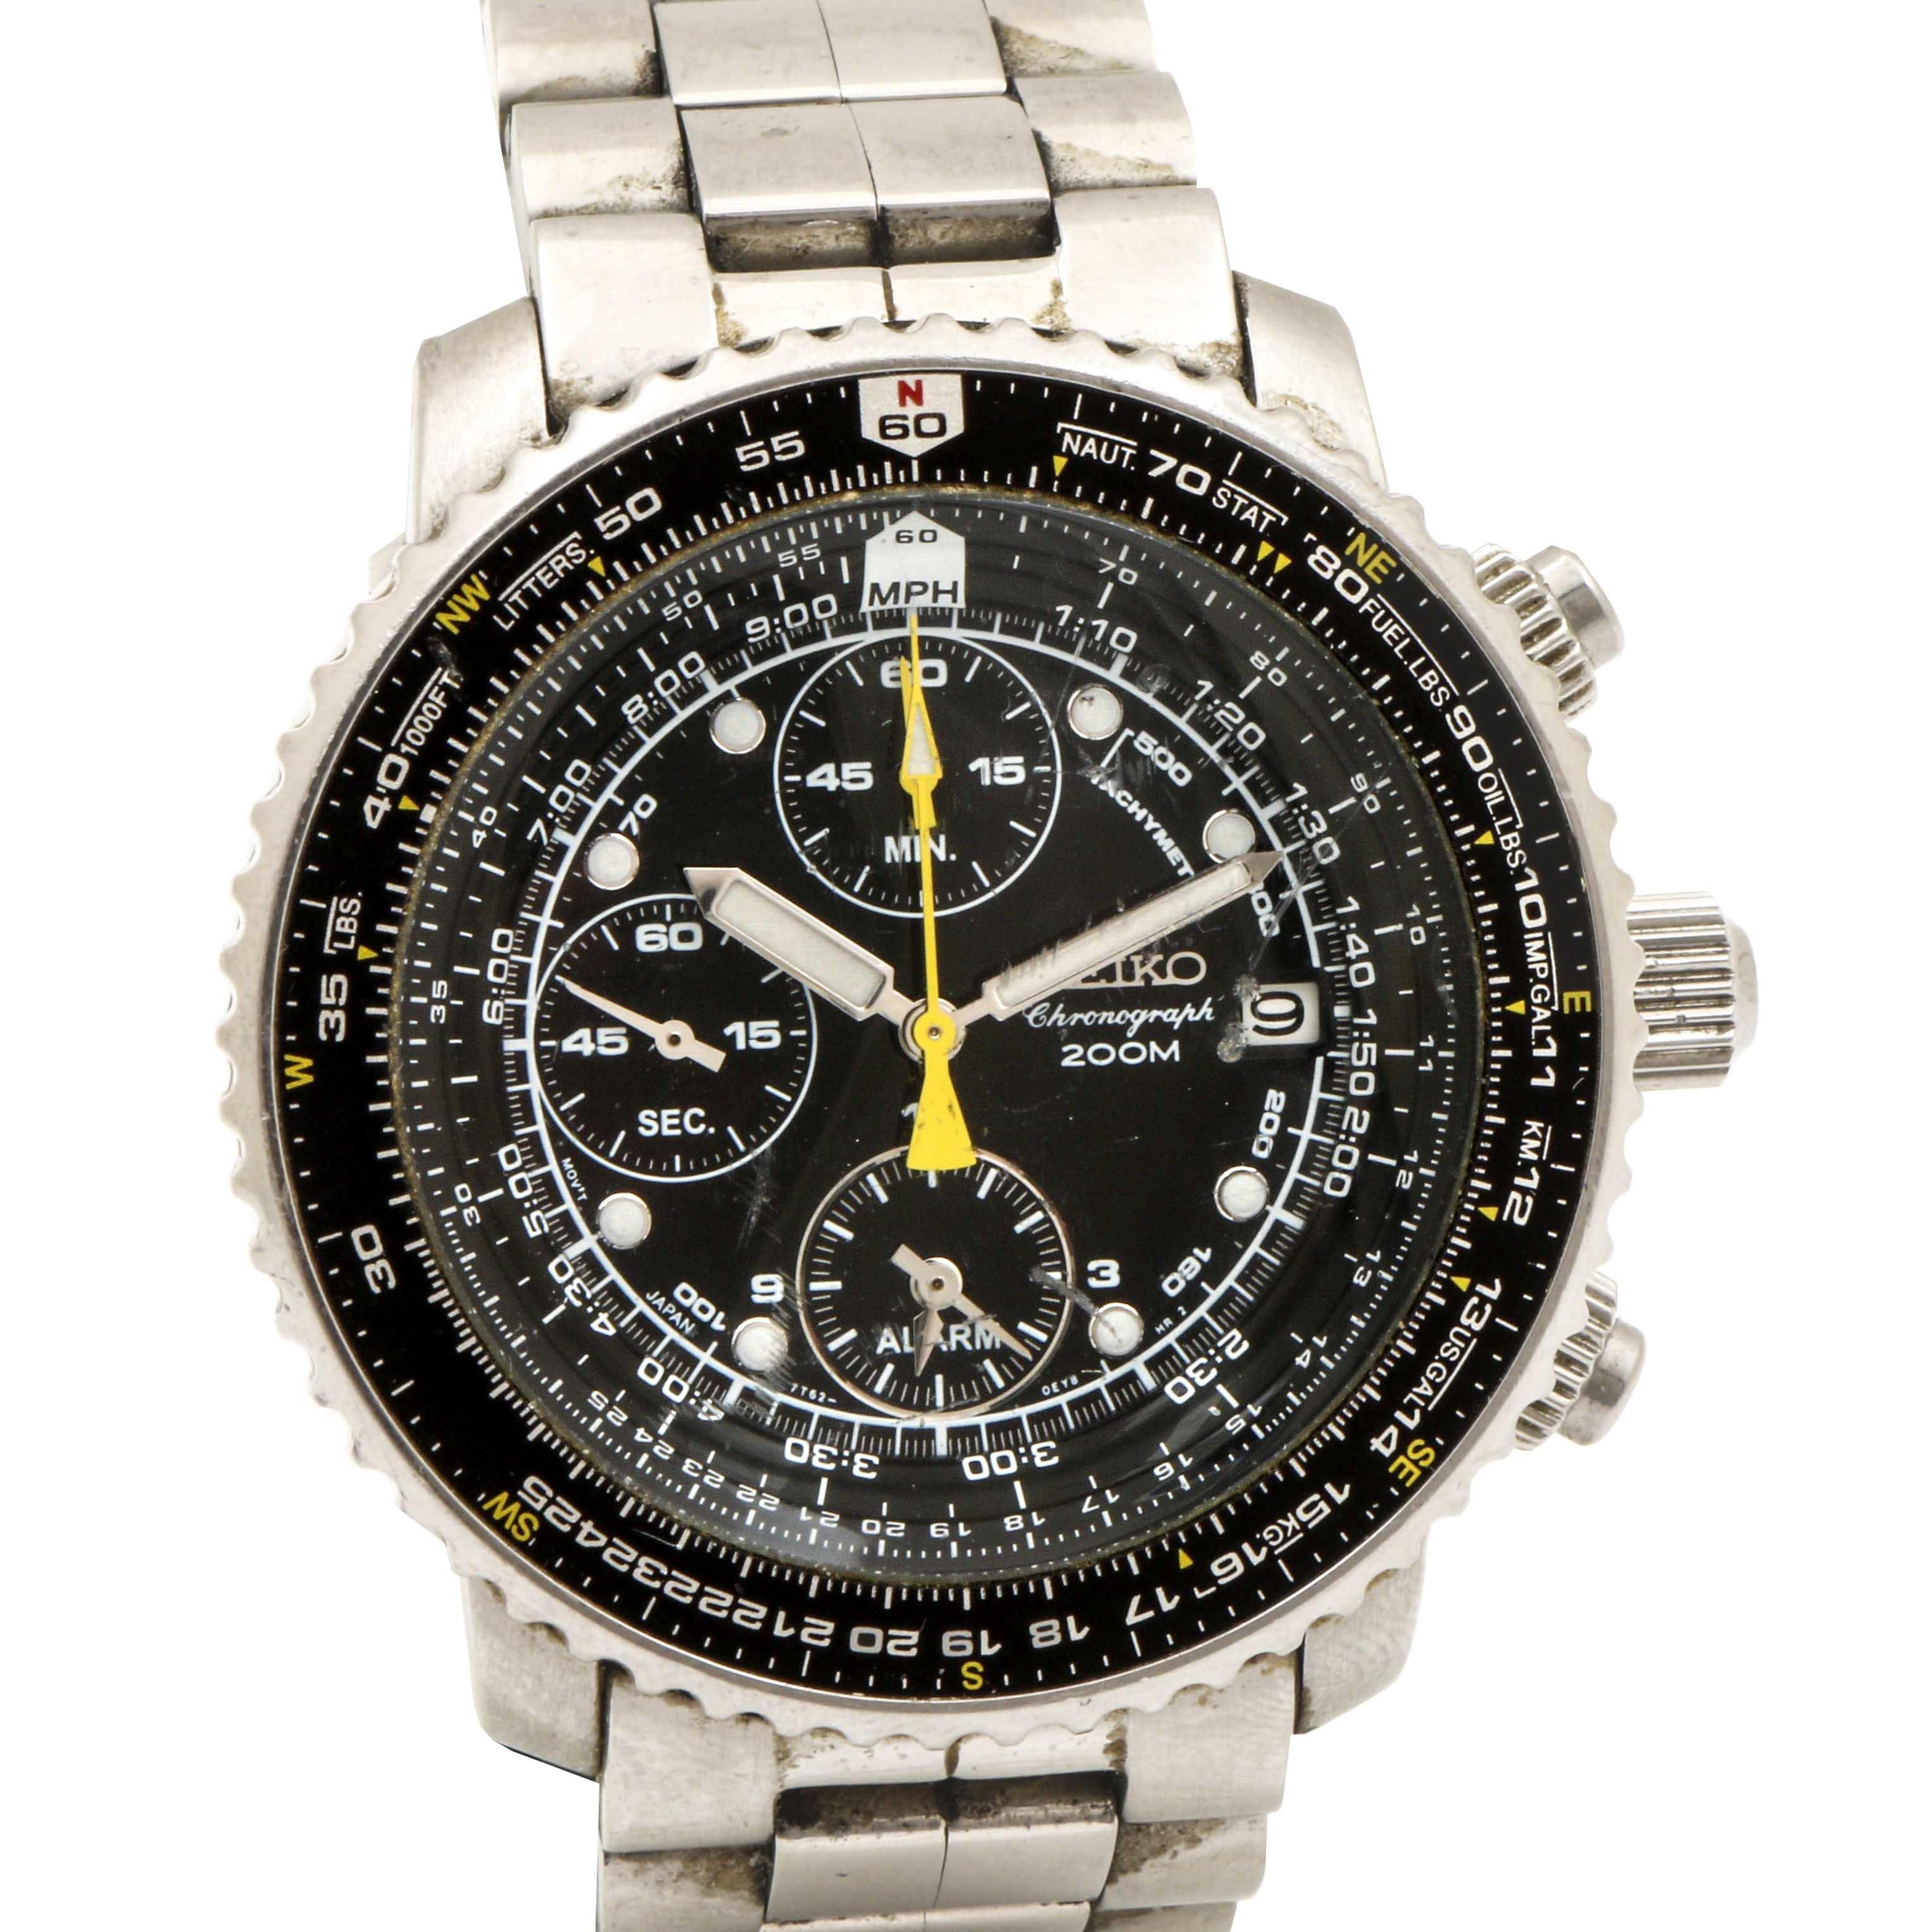 Seiko Chronograph Pilot Wristwatch